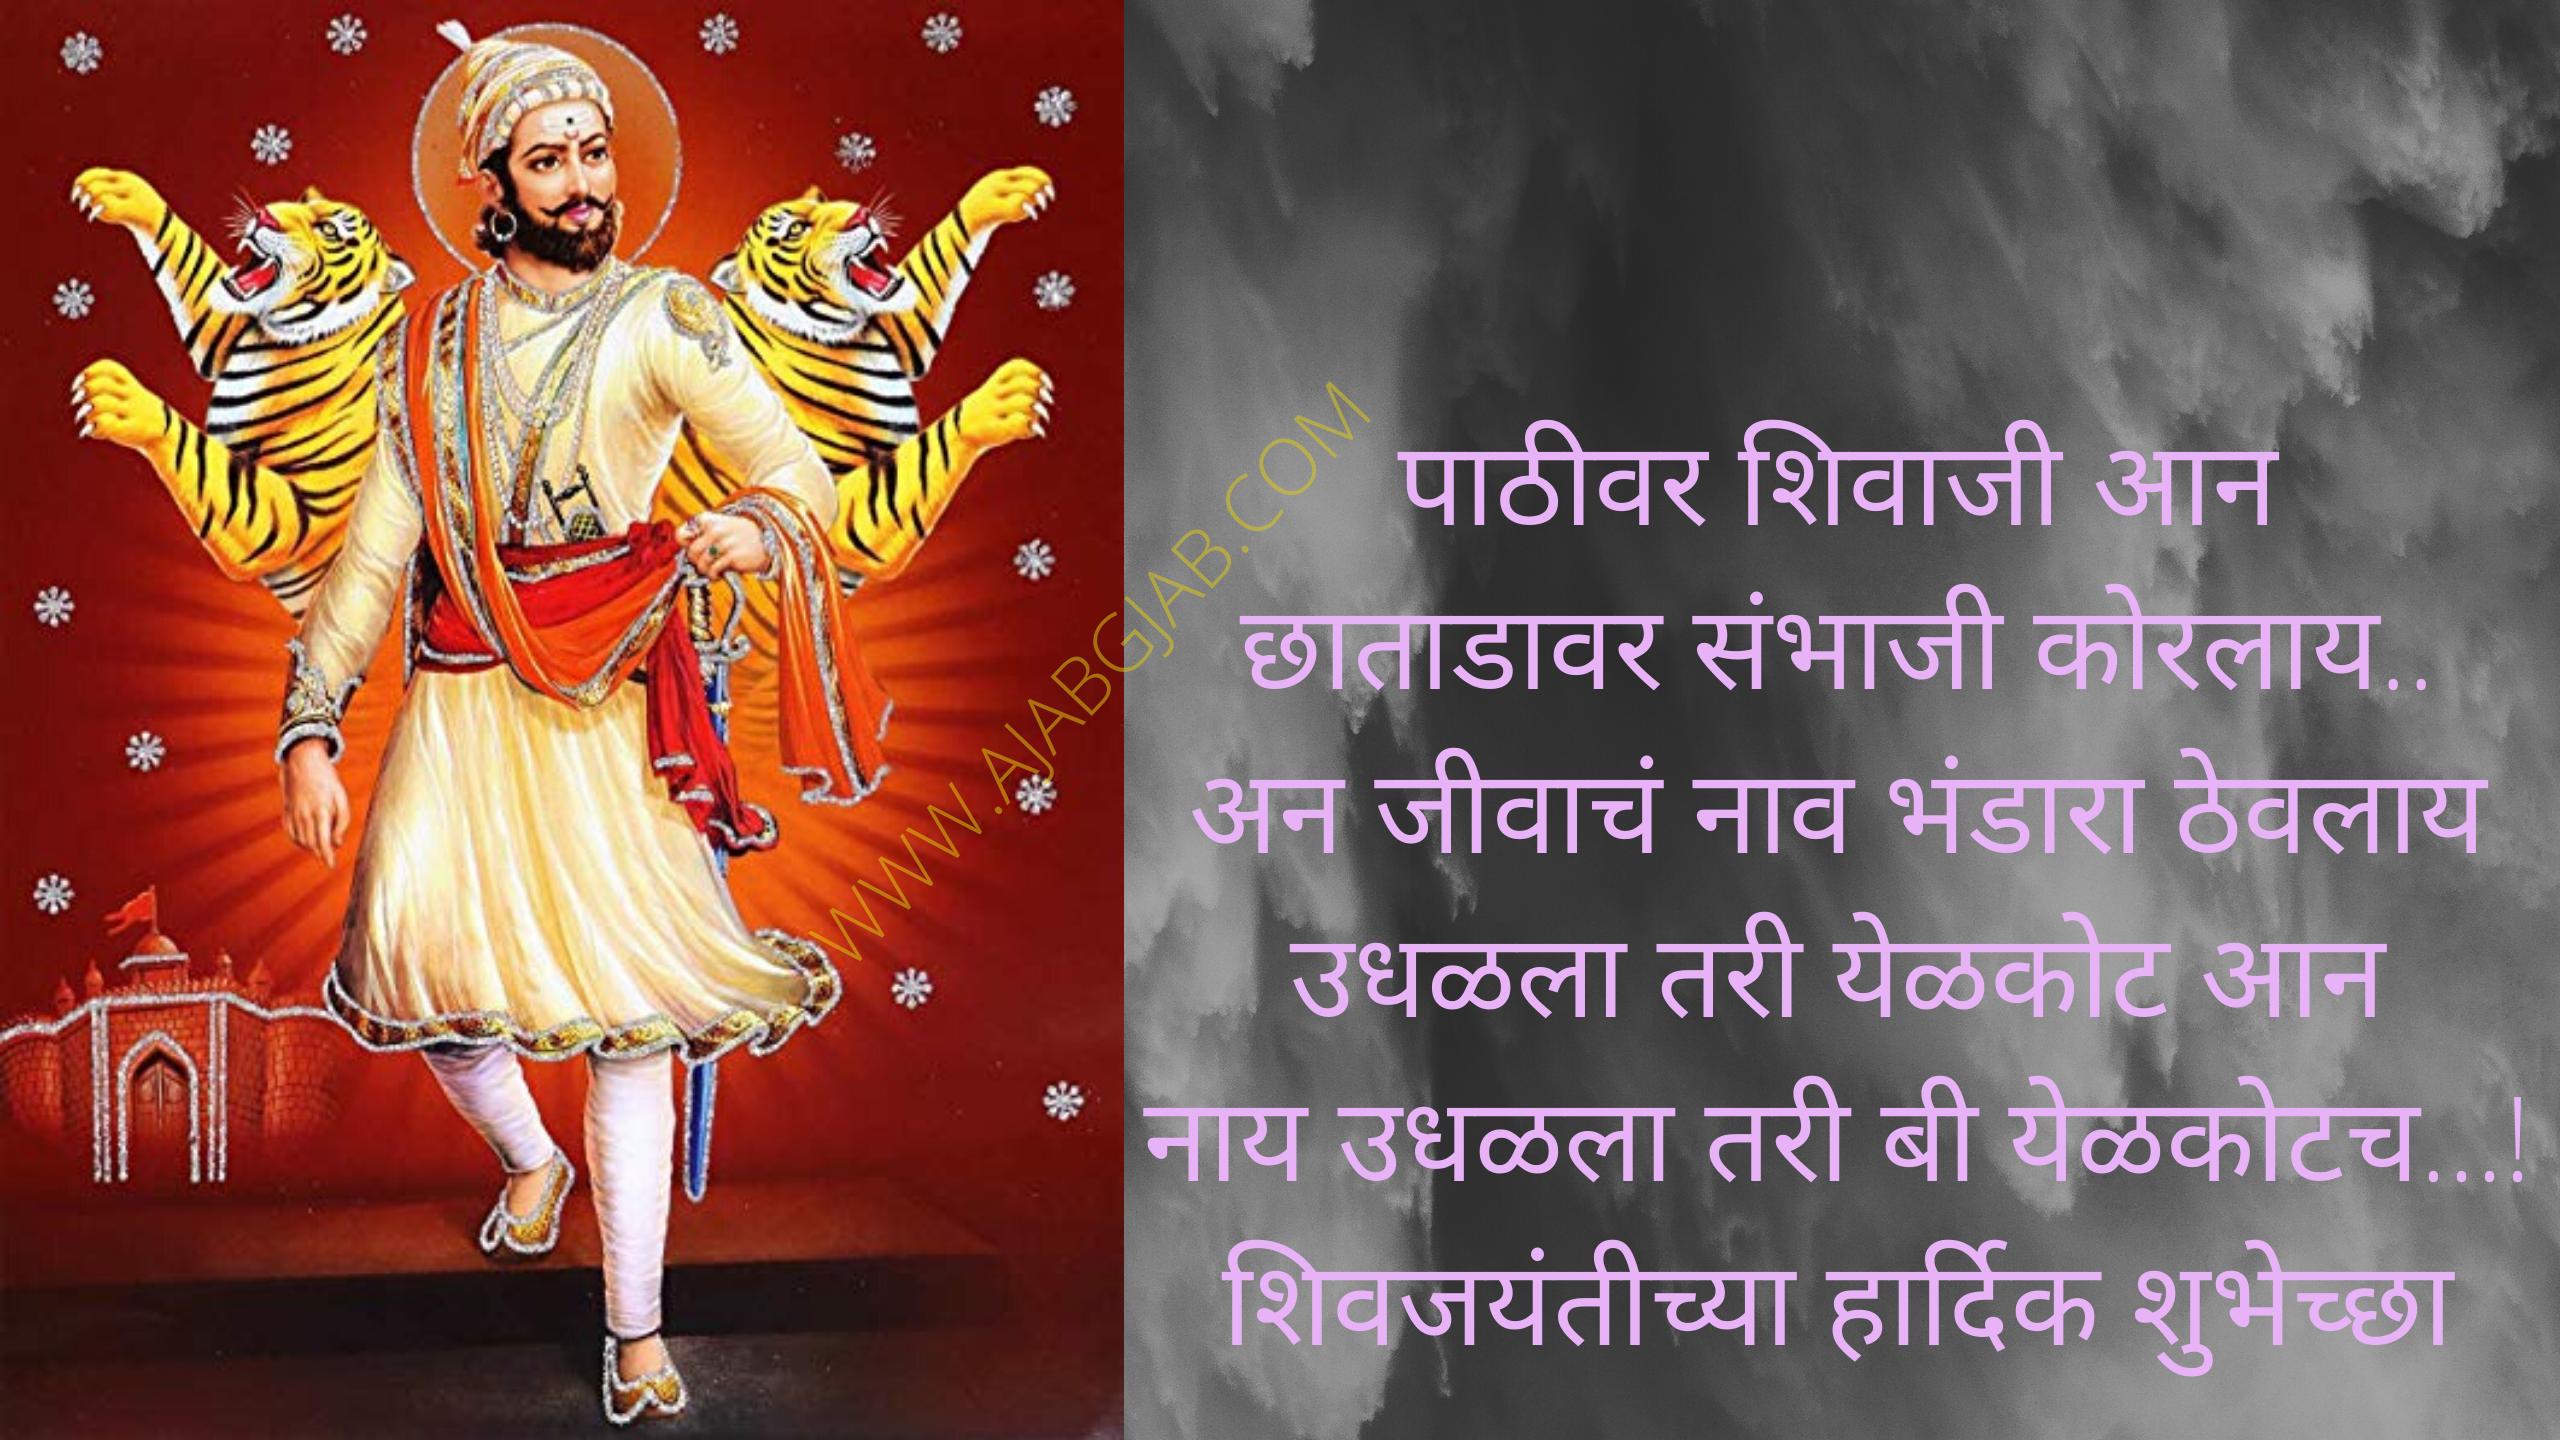 Shiv Jayanti Messages in Marathi